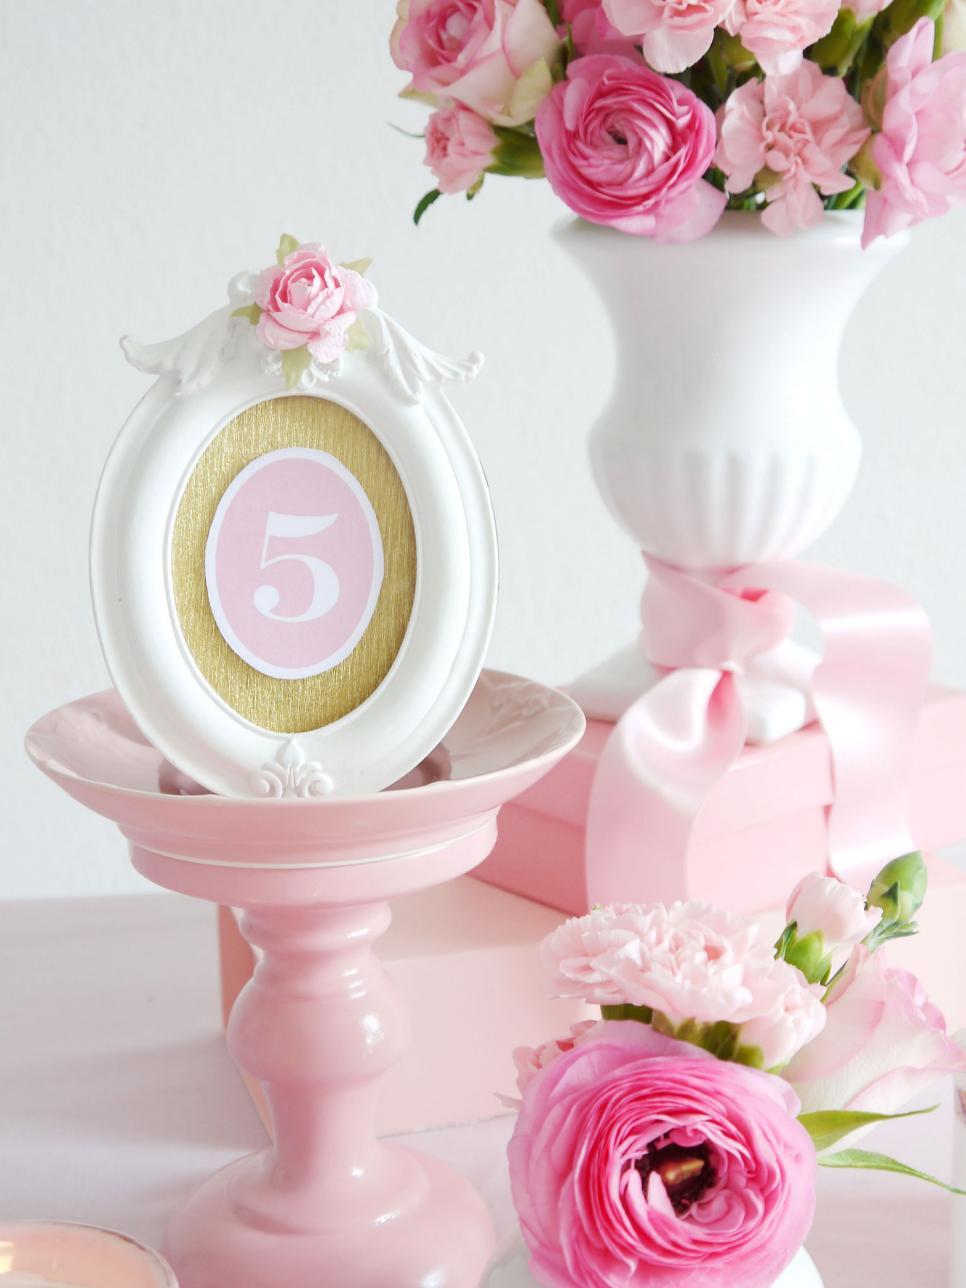 Original Birds Party Romantic DIY Wedding Table Number 8 s3x4.jpg.rend.hgtvcom.966.1288 bb894